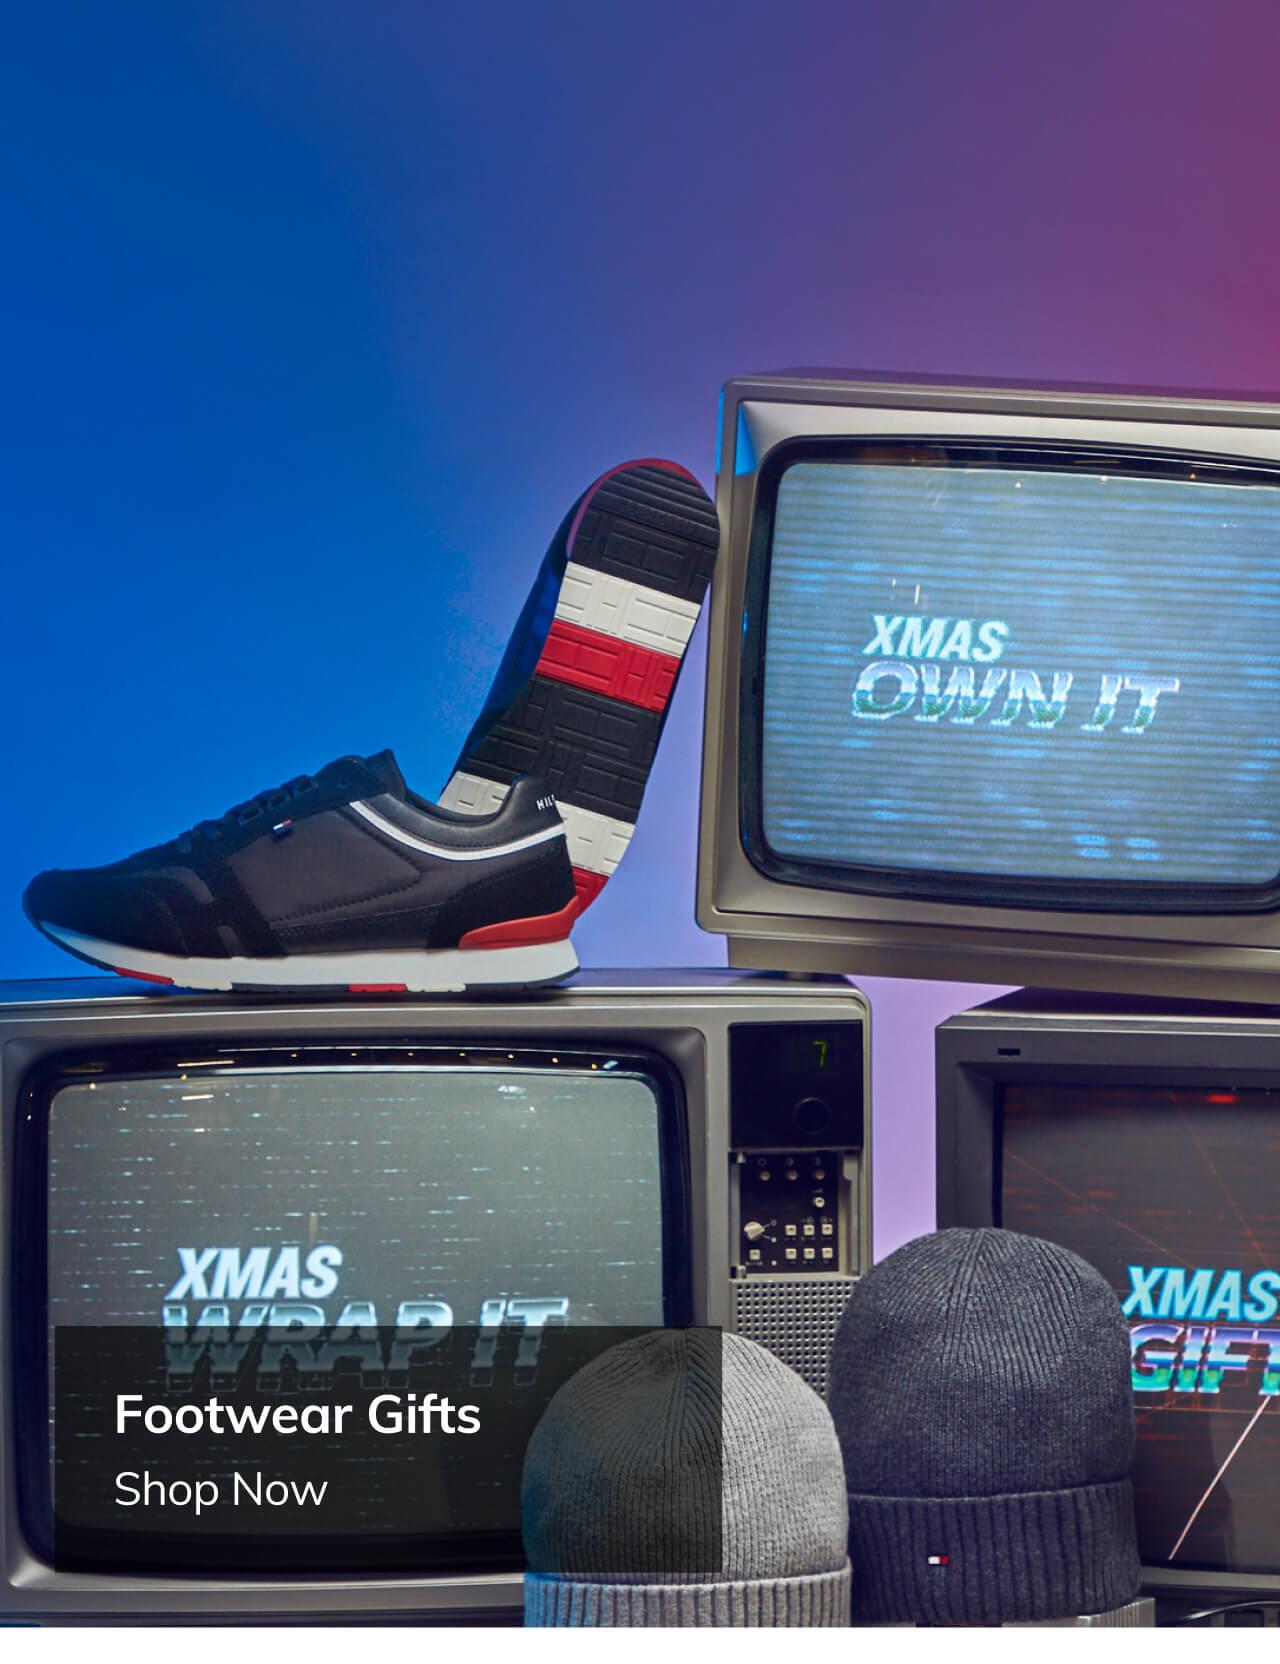 Footwear Gifts